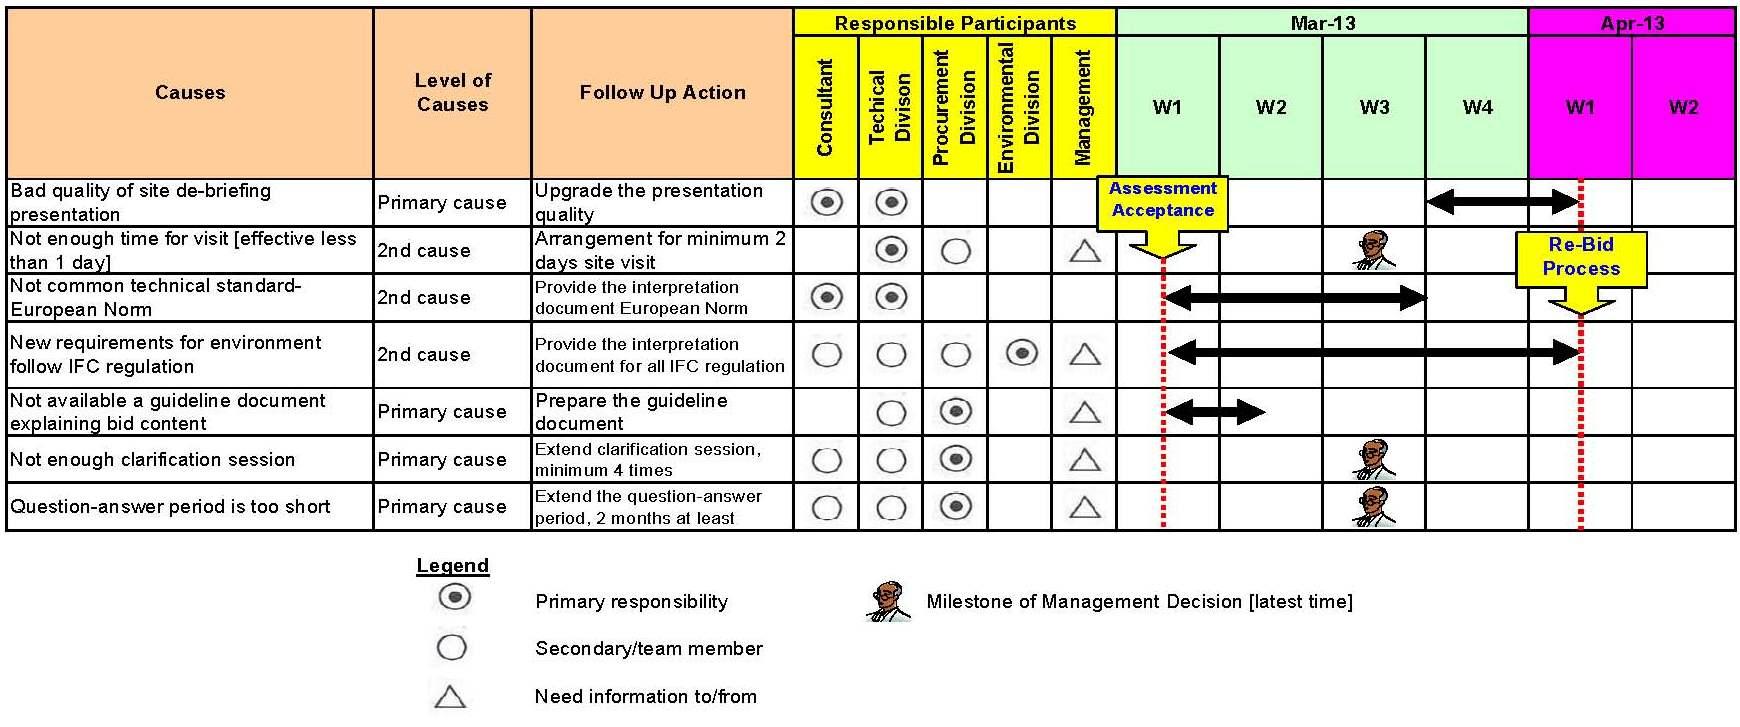 risk management plan blank template - thomyainuideizeo.tk